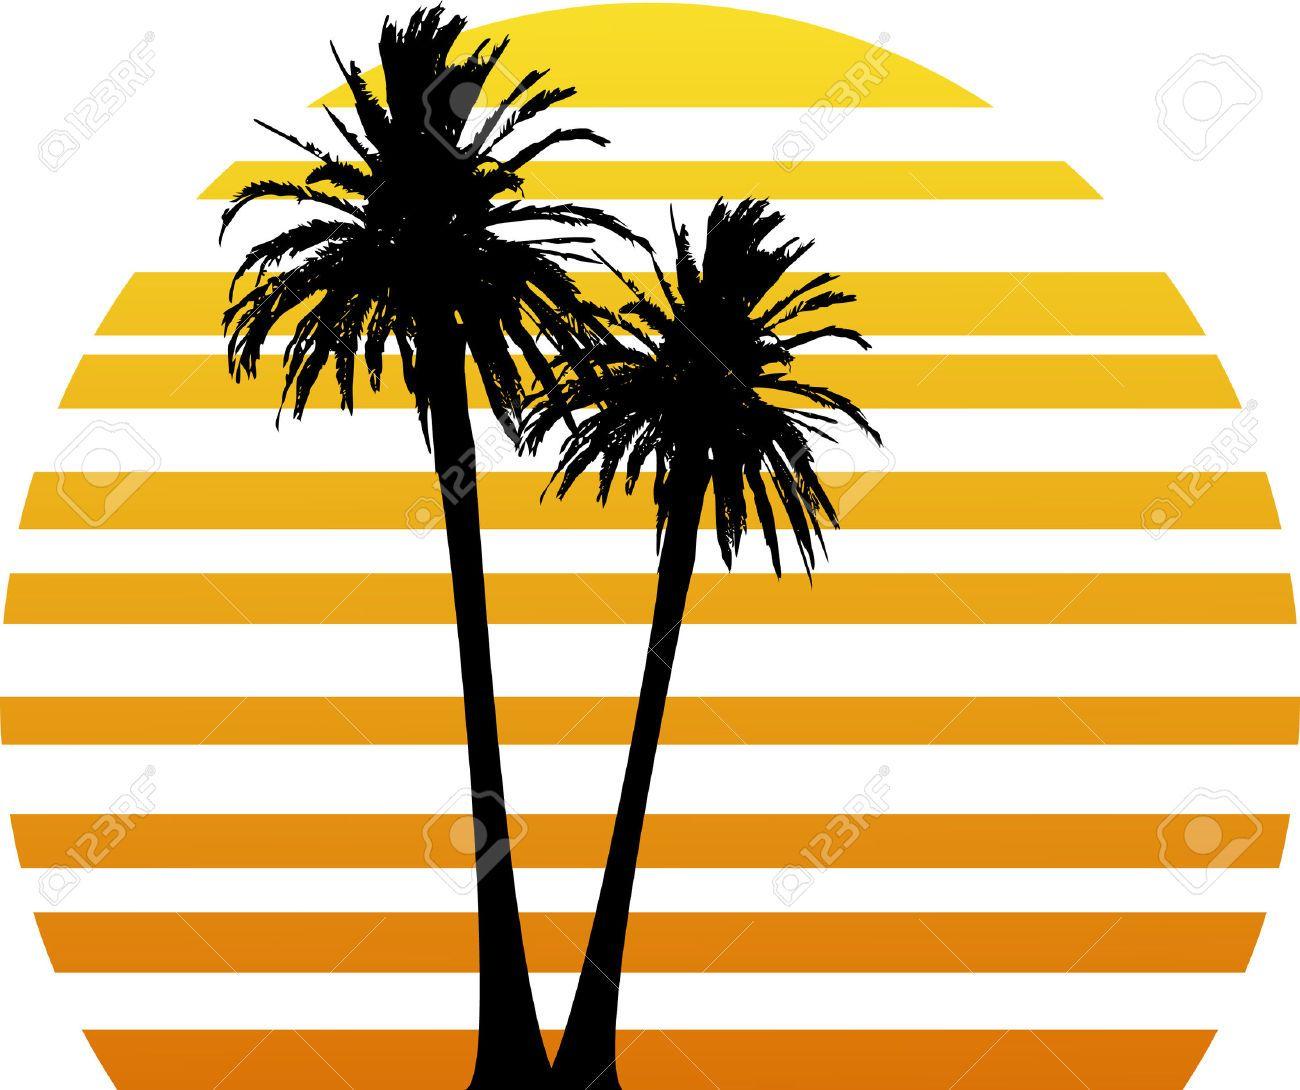 palm tree design logo google search kabana mural pinterest rh pinterest com Philipens Money Philipens Food